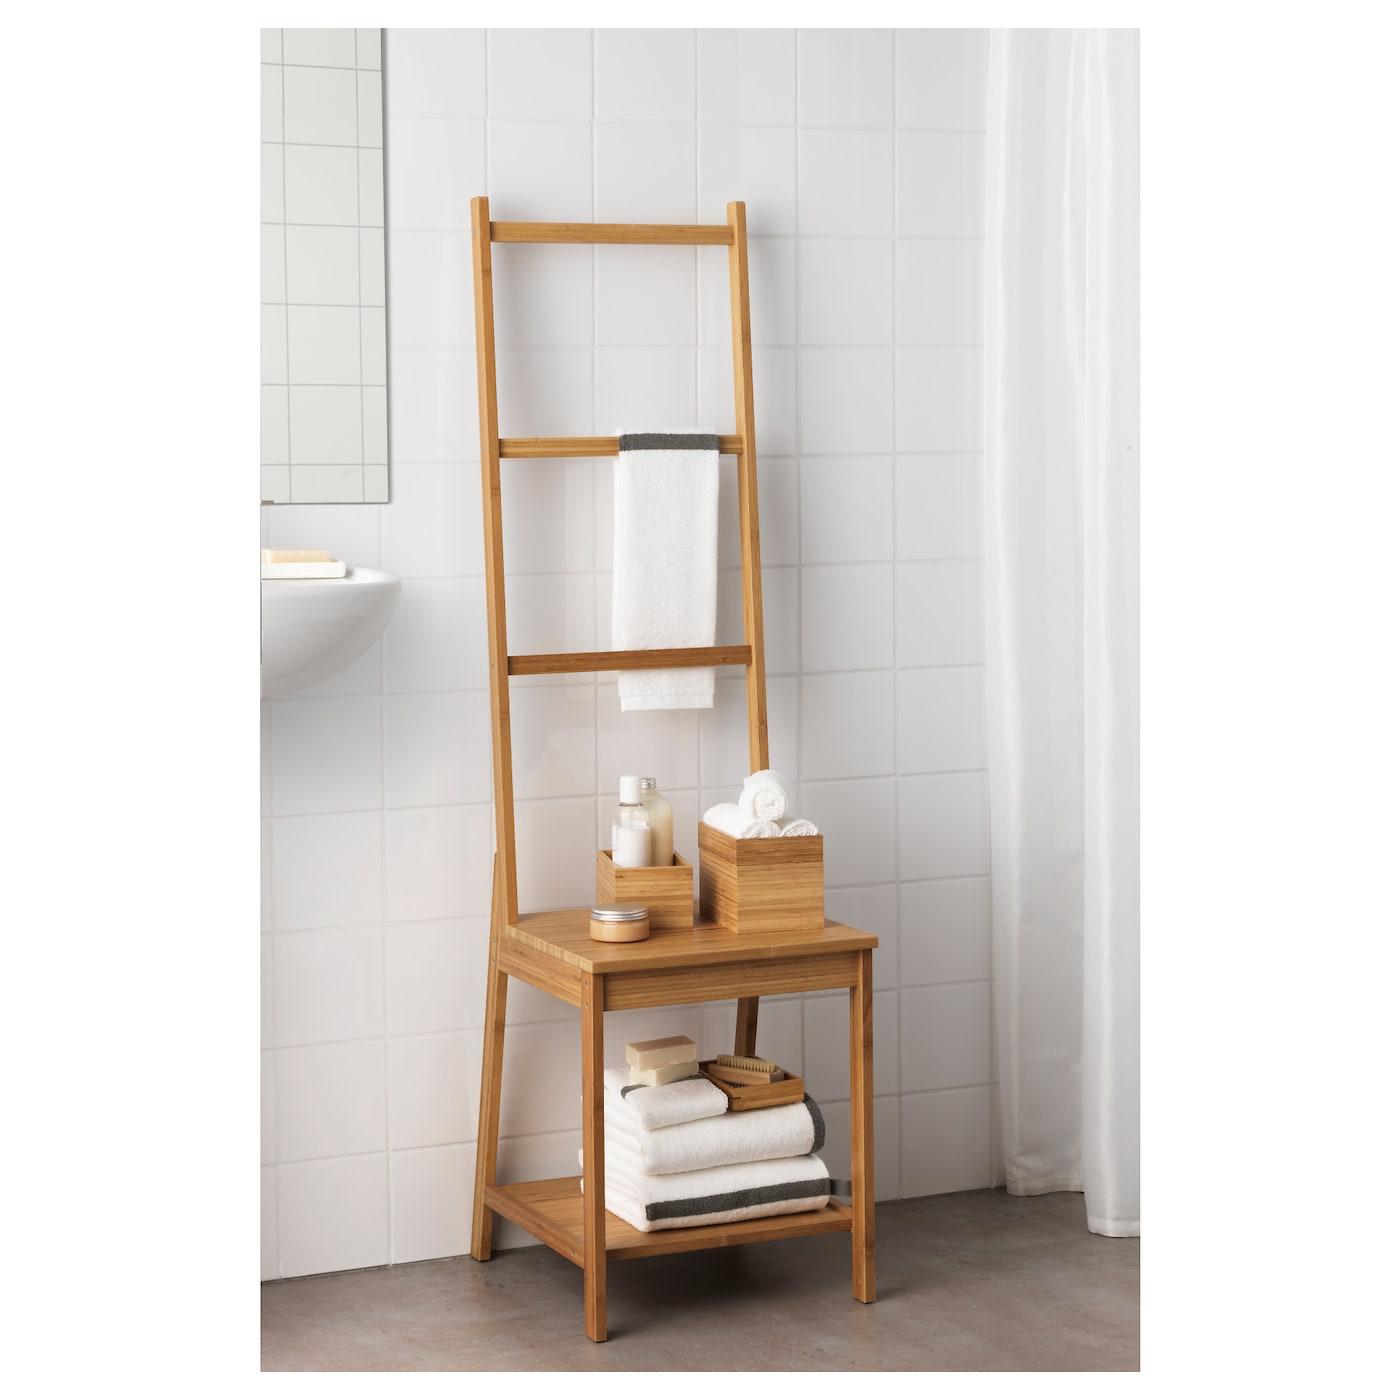 "RÅGRUND chair with towel rack bamboo 15 3/8 "" 17 3/8 "" 55 1/8 """